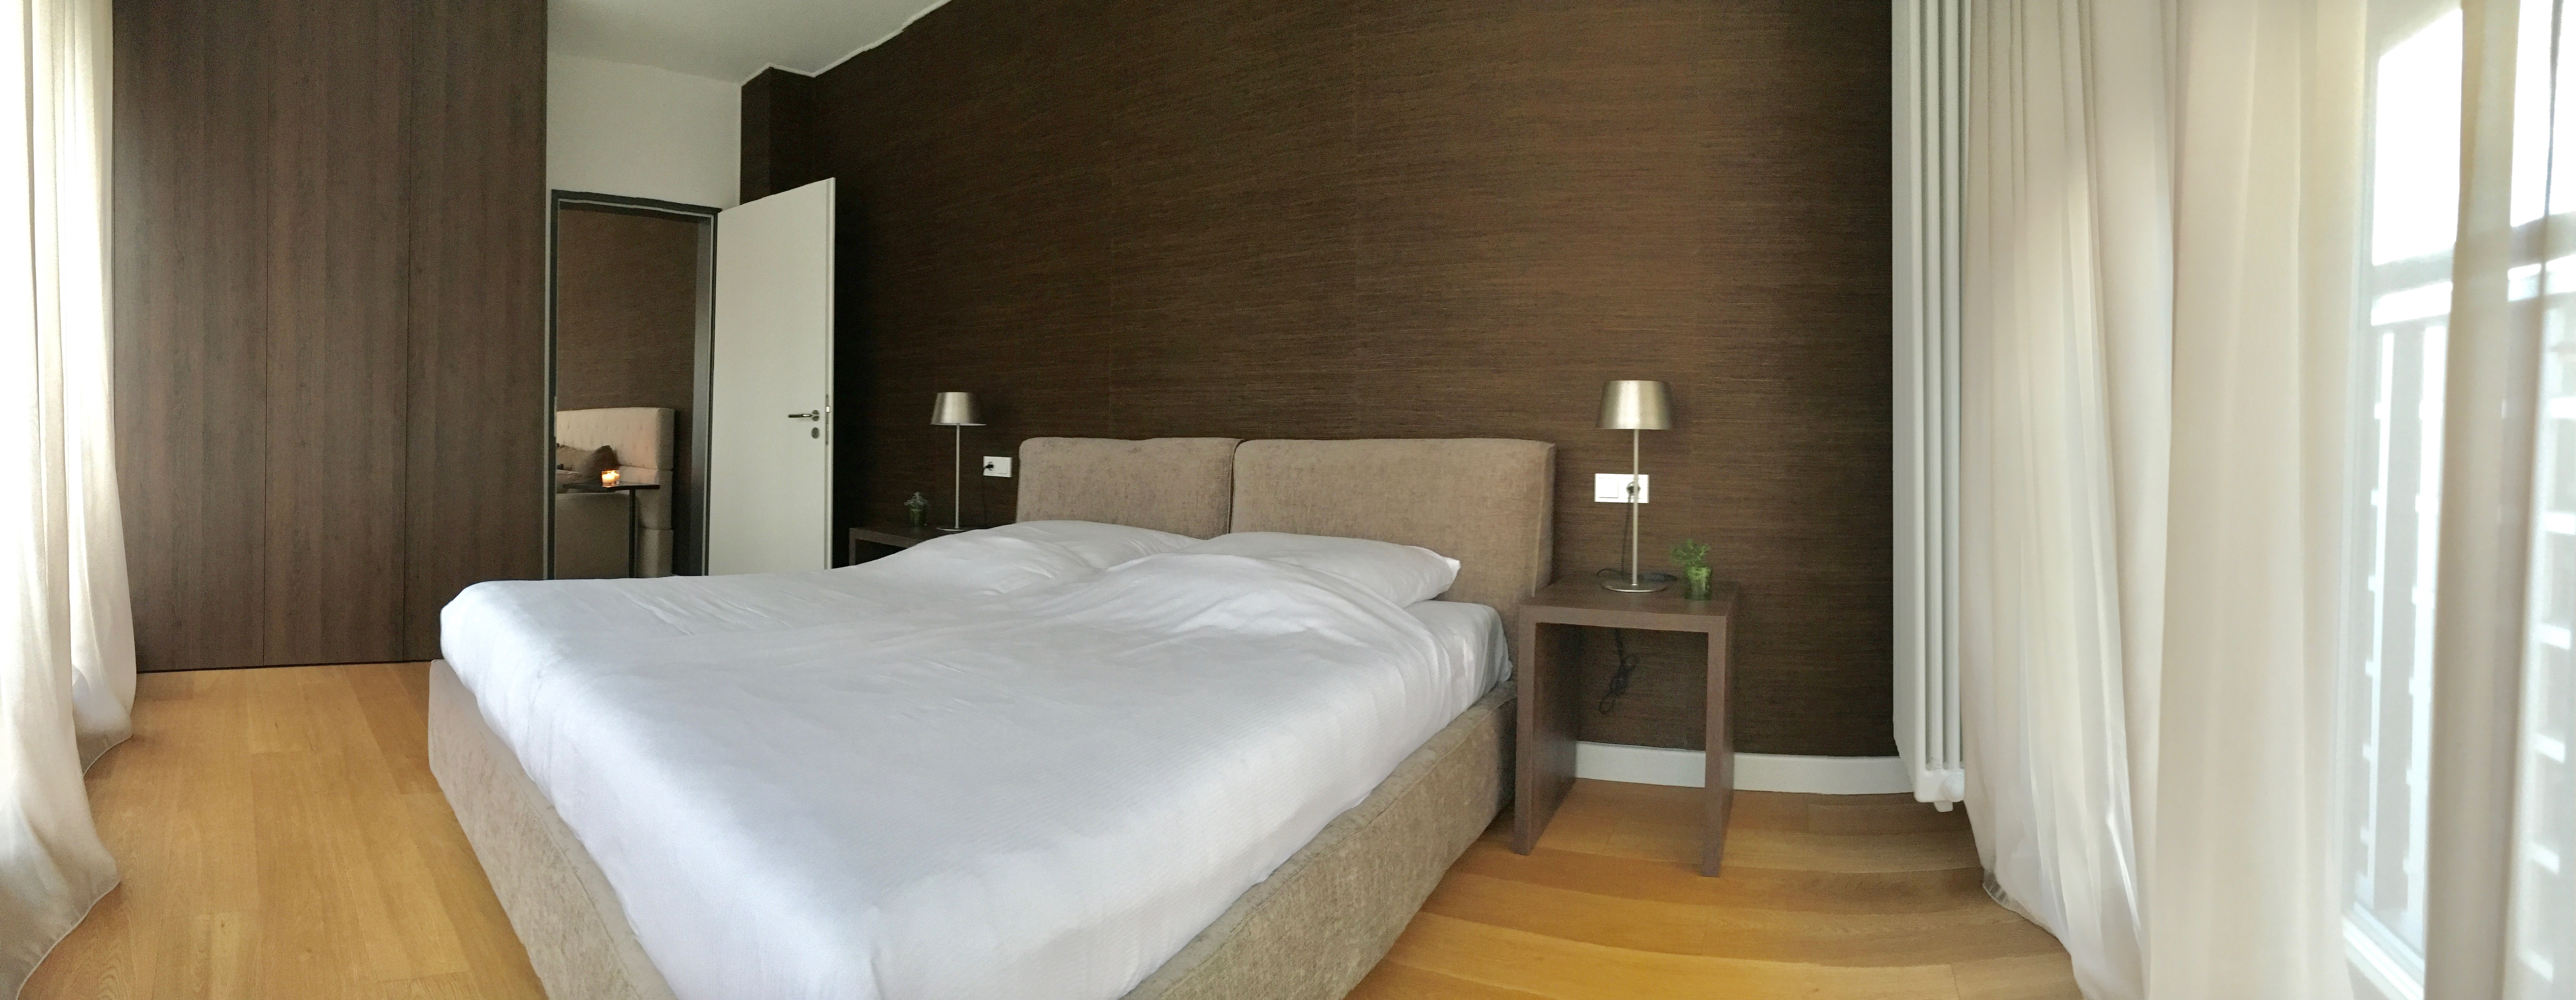 Schlafzimmer Für Interims-Berliner  by andy - for better moods